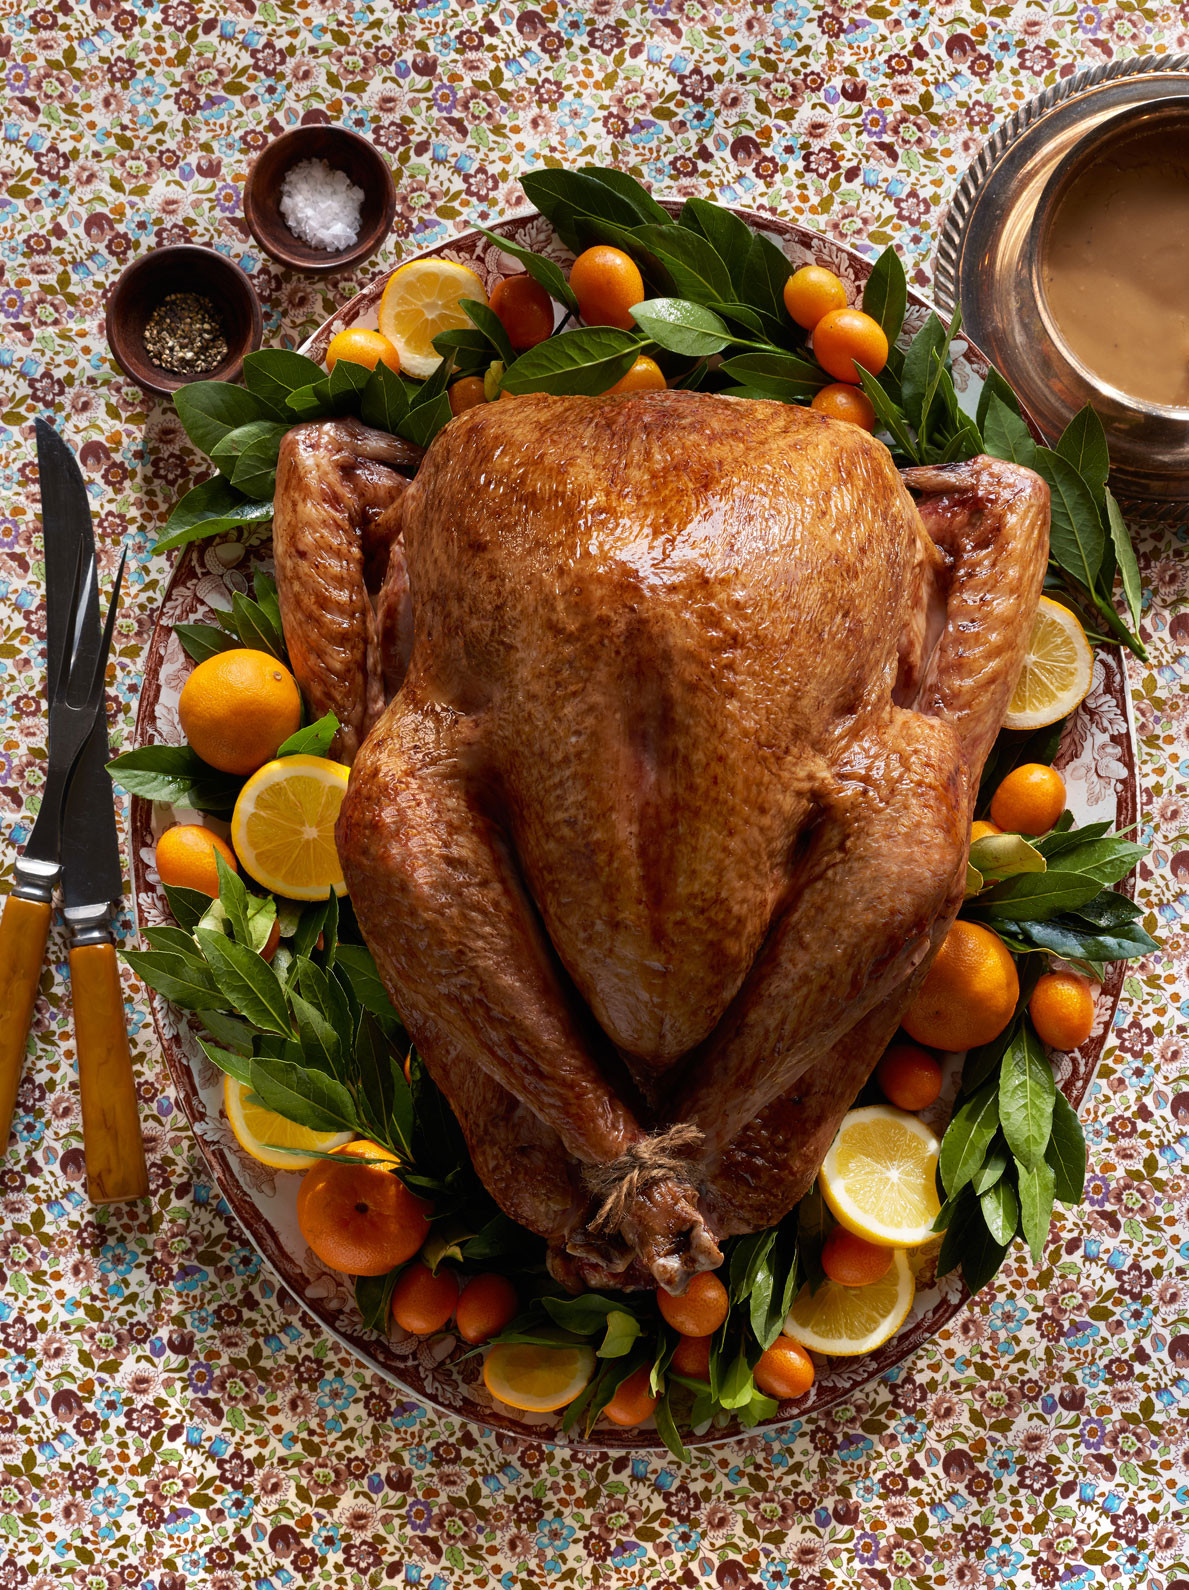 Turkey On Thanksgiving  25 Best Thanksgiving Turkey Recipes How To Cook Turkey